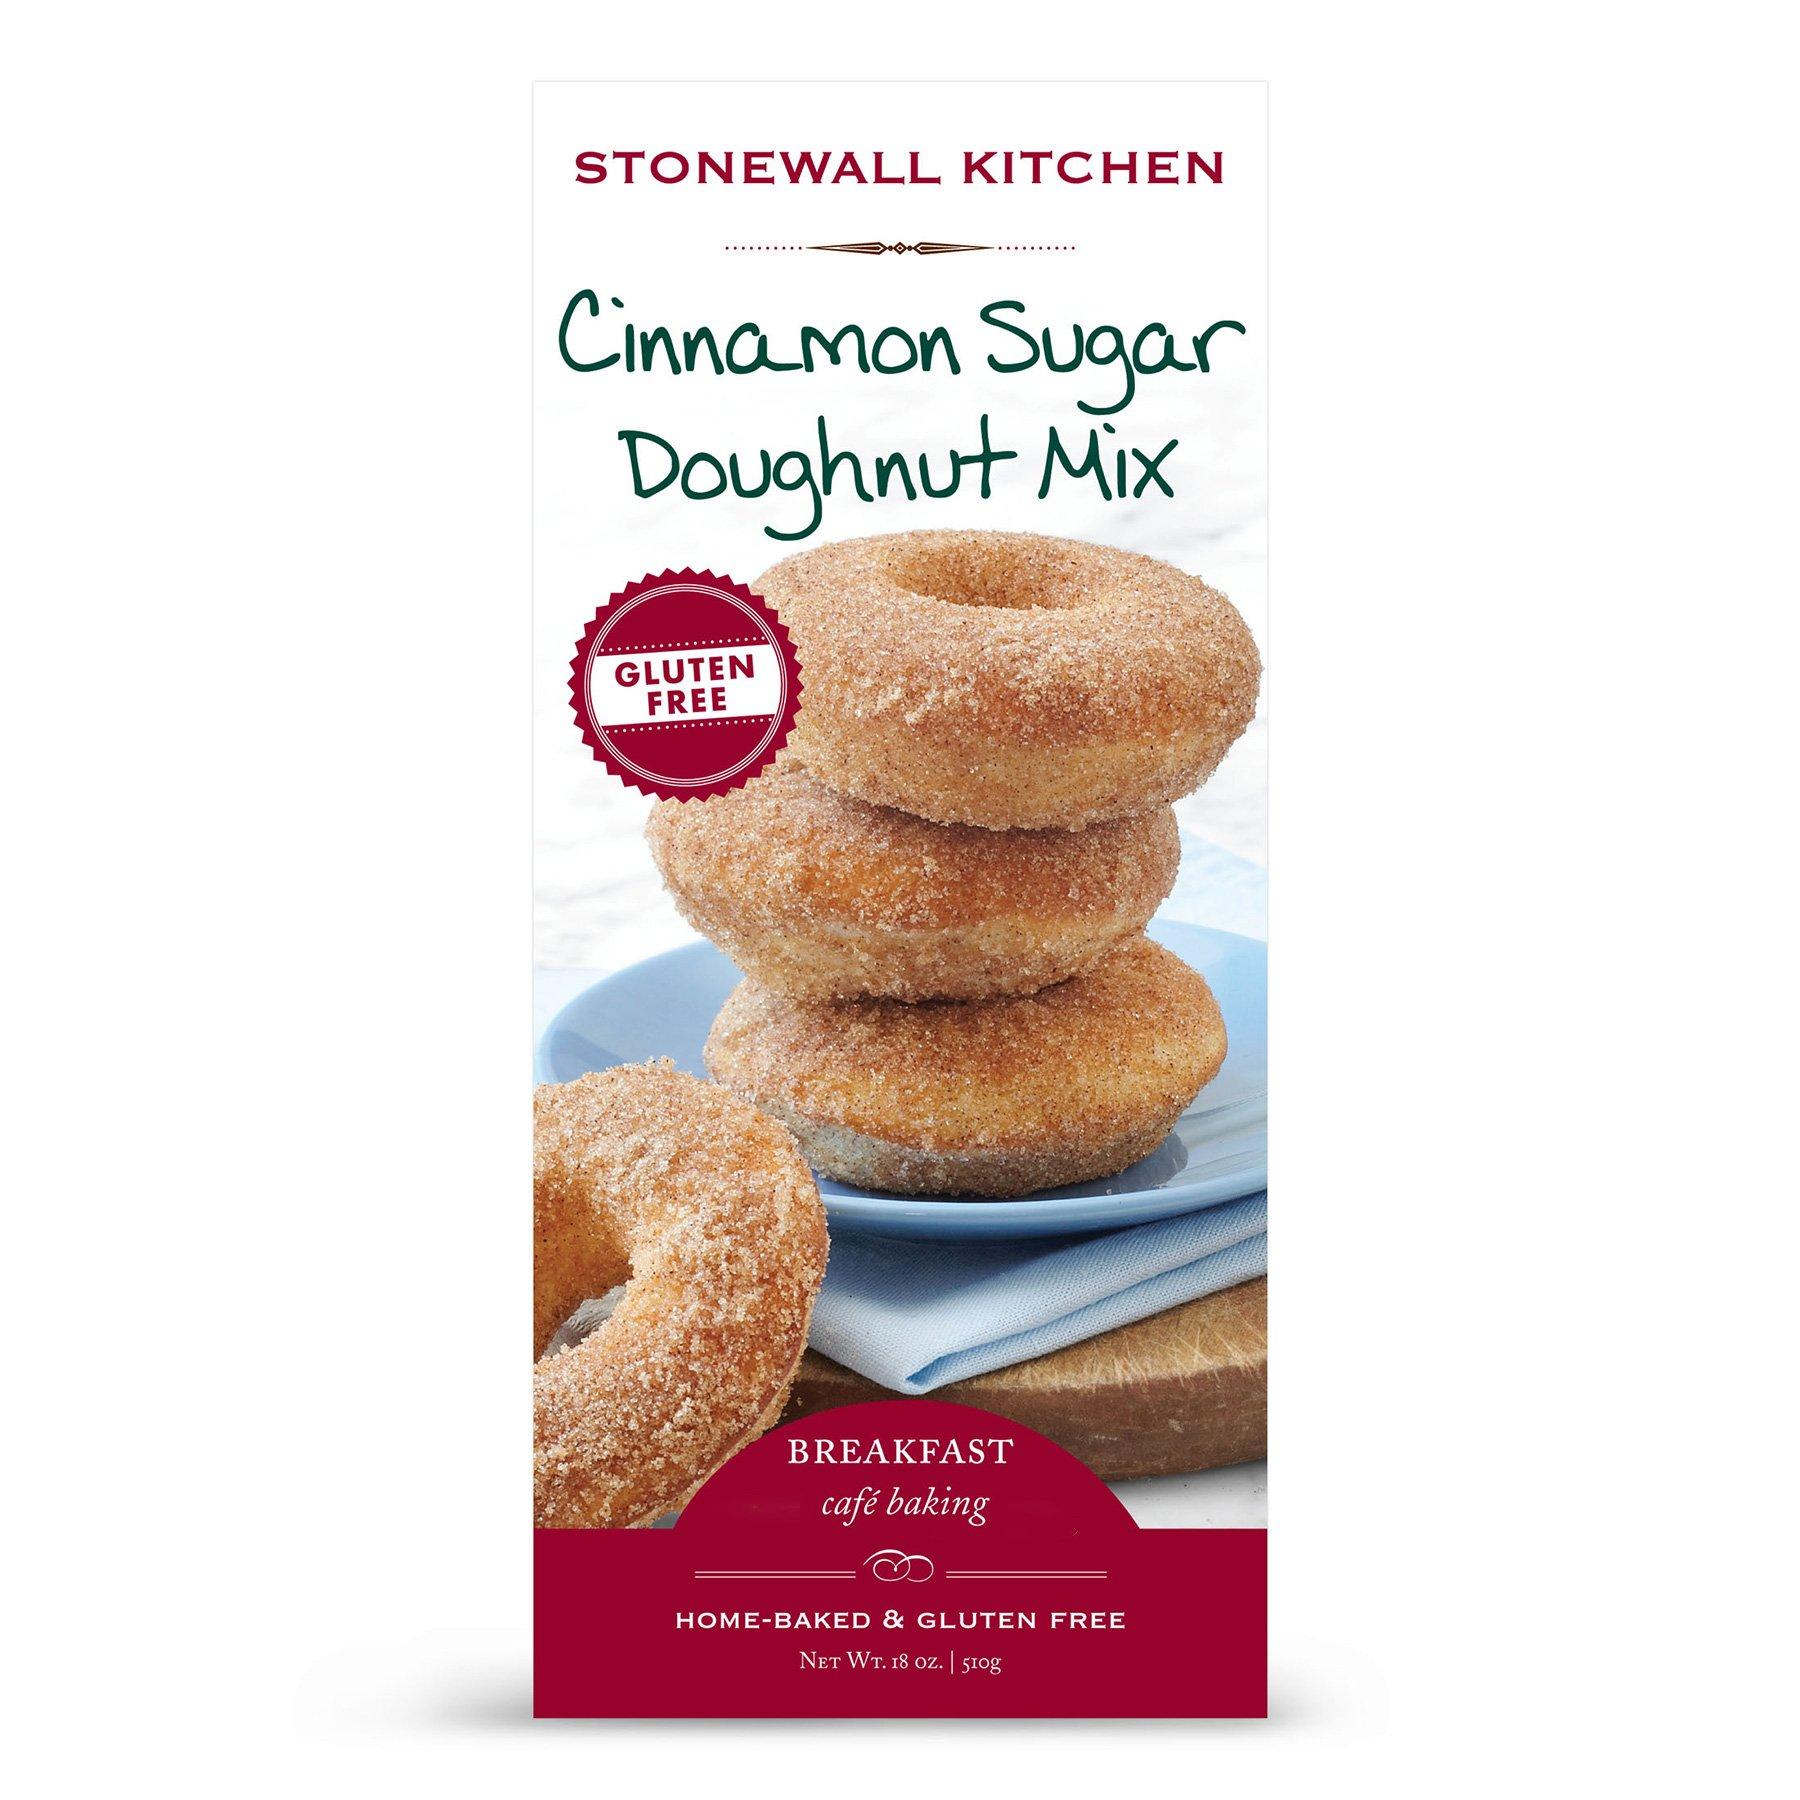 Stonewall Kitchen Gluten Free Cinnamon Sugar Doughnut Mix, 18 Ounce Box by Stonewall Kitchen